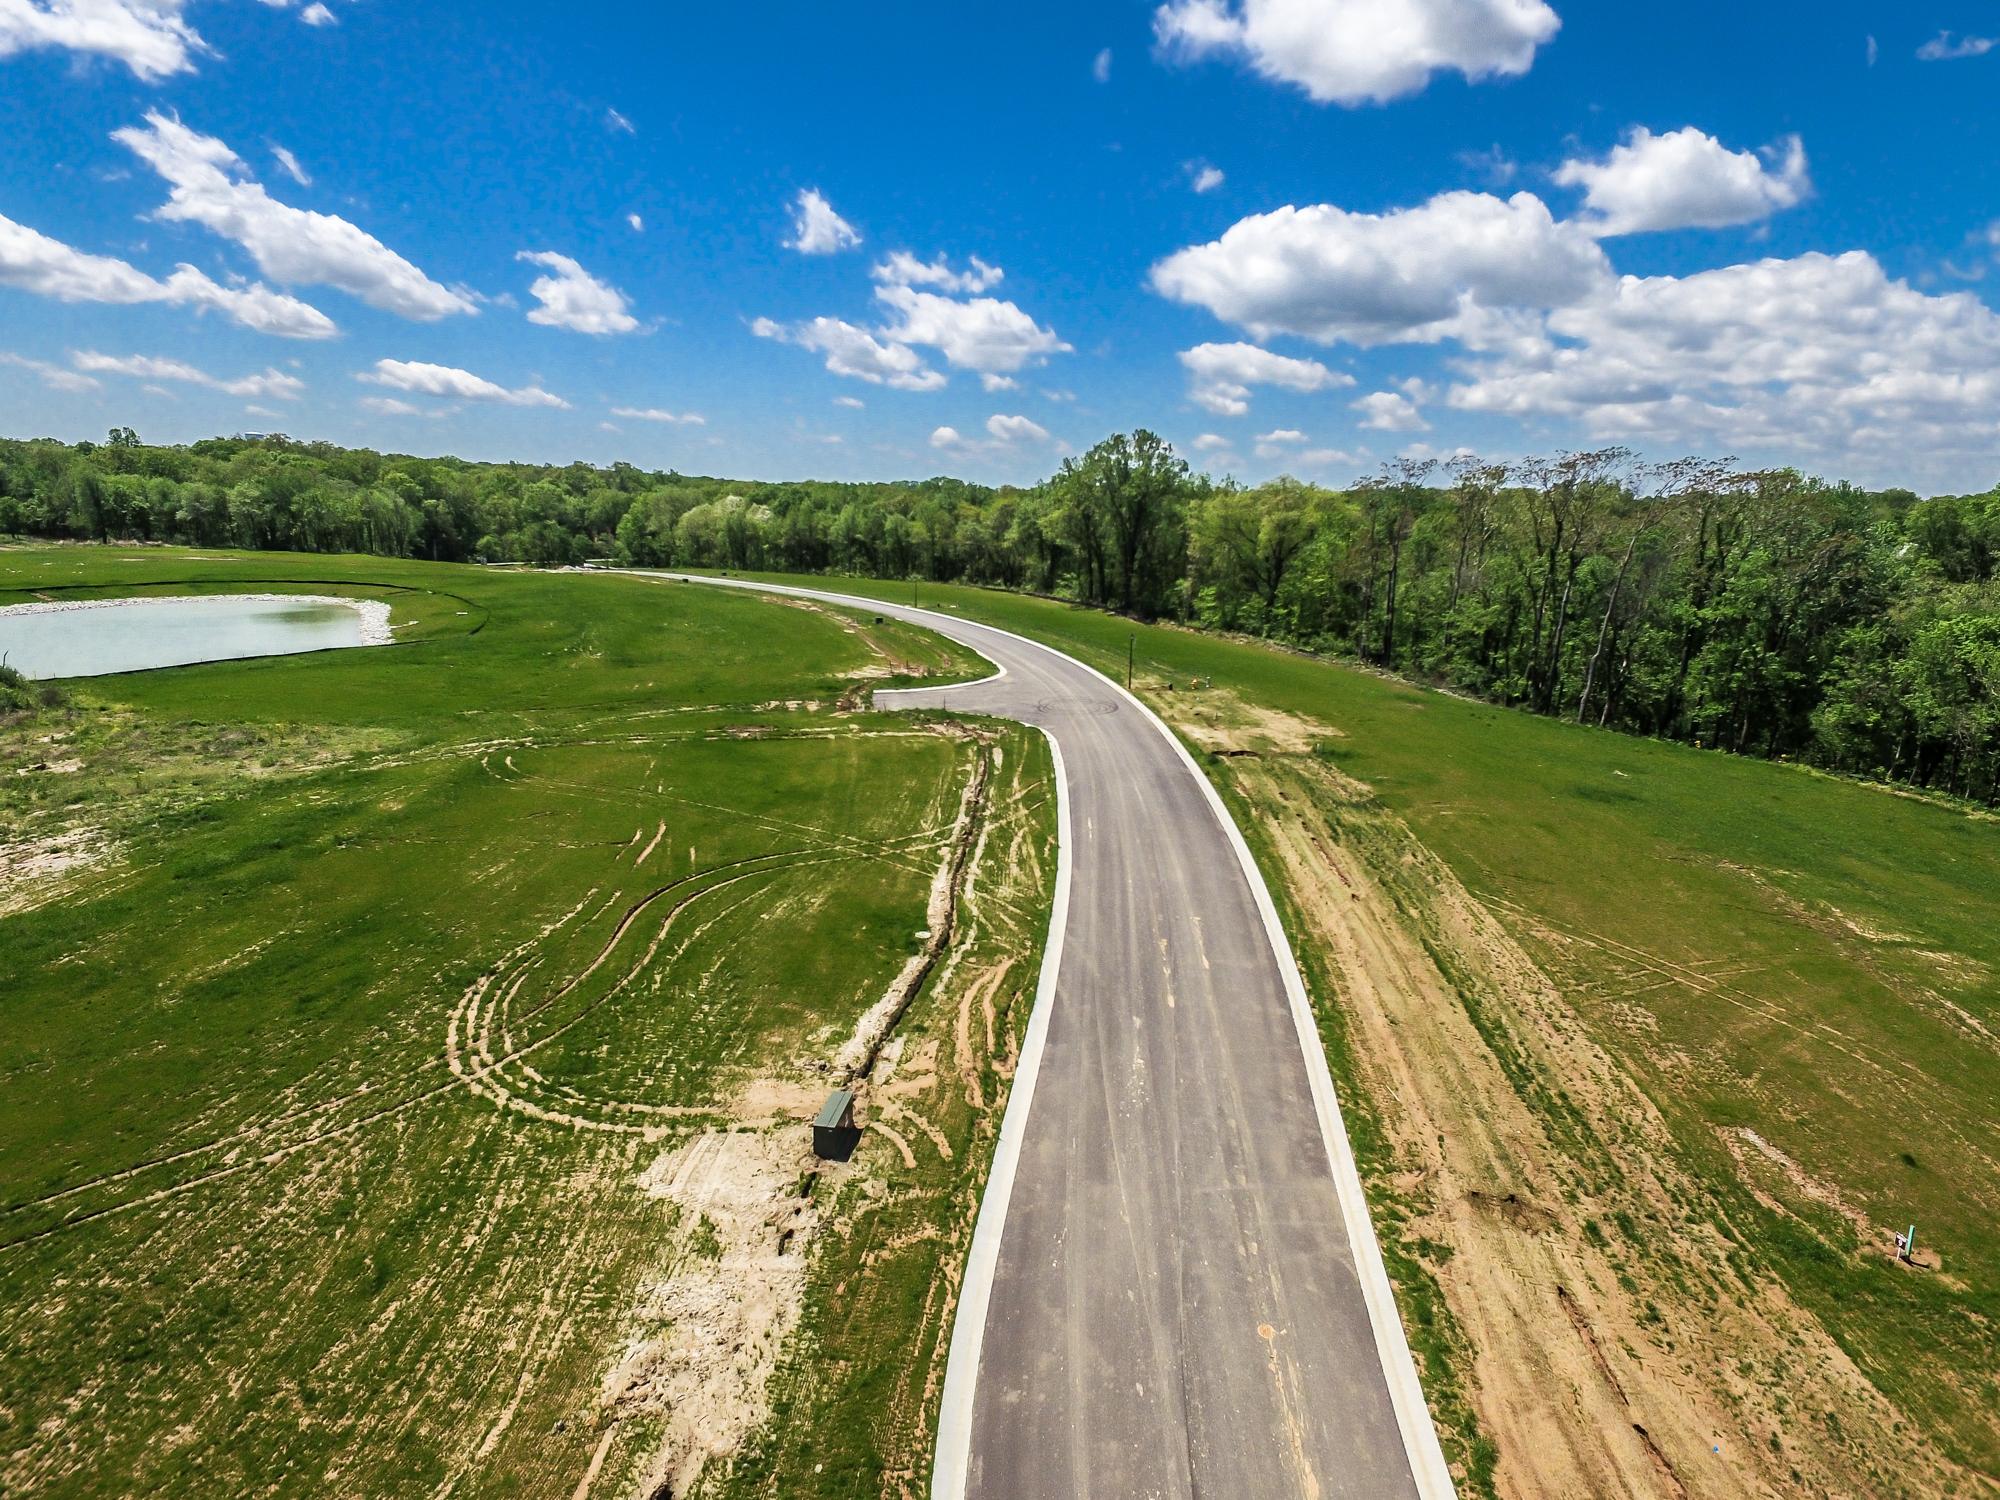 Bethel_Ridge_Farms_O'Fallon_Illinois_Aerials_Progress_5.3.17-14.jpg